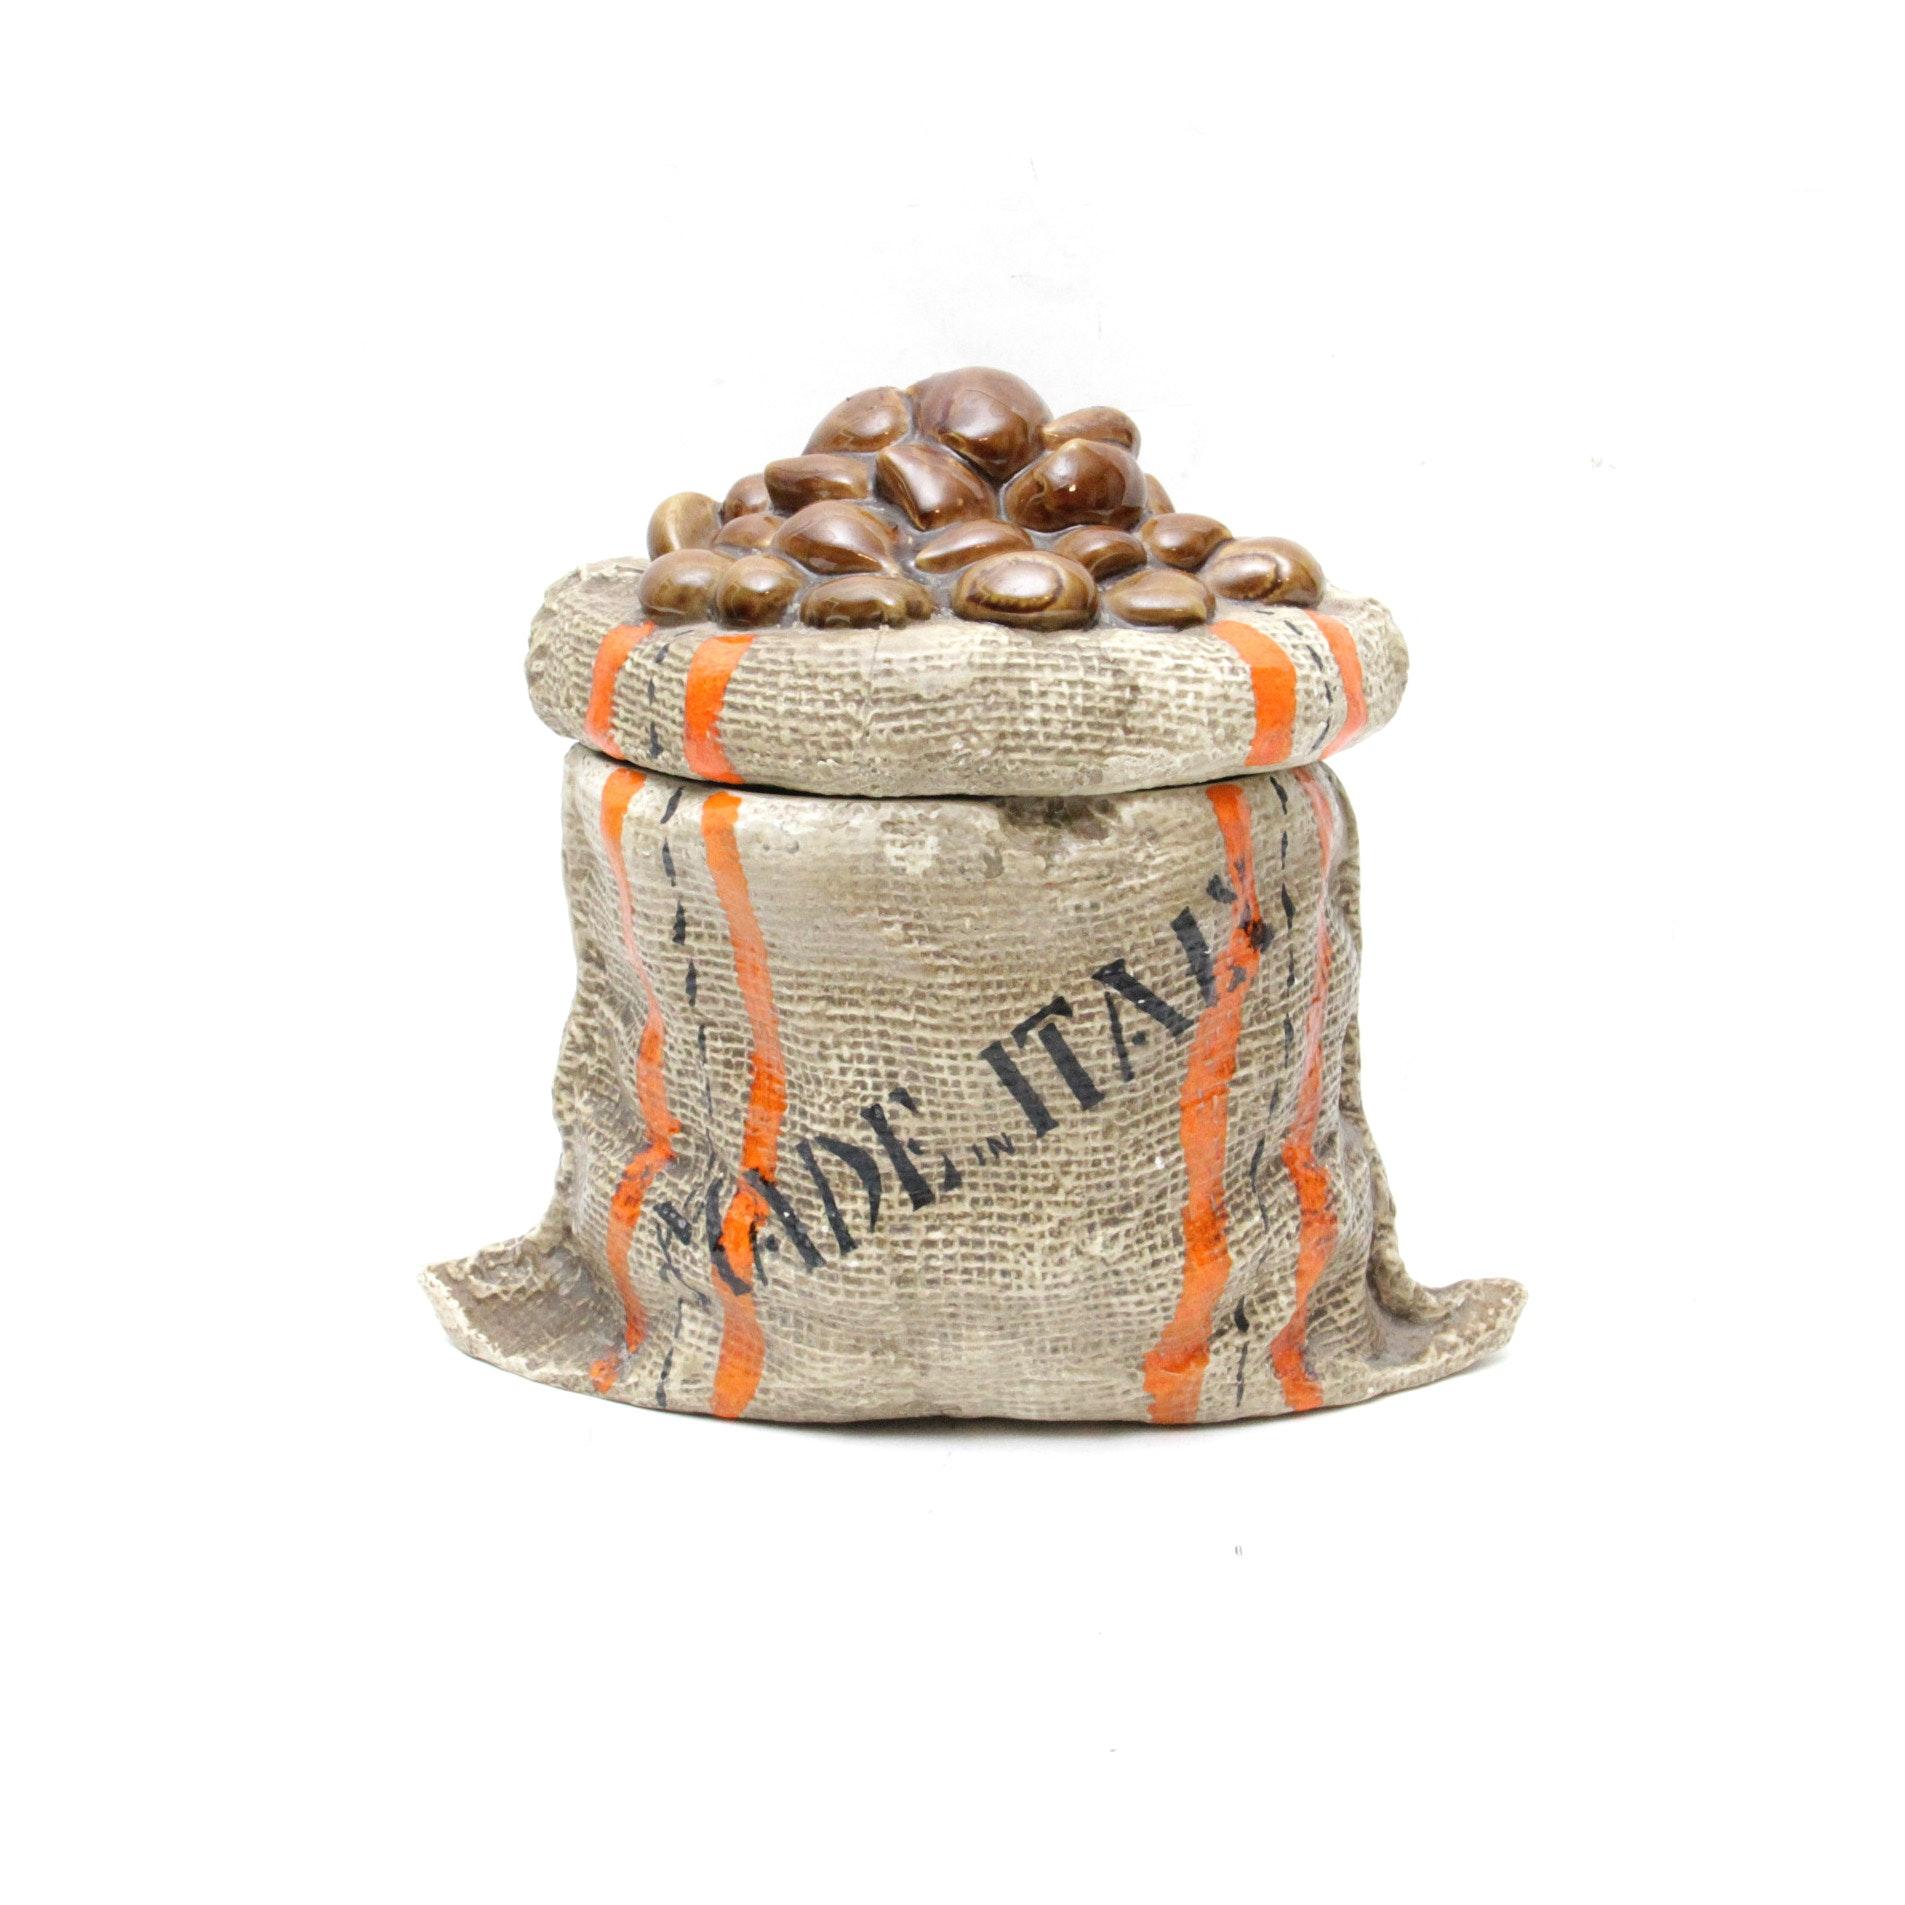 Mancioli Italian Ceramic Cookie Jar